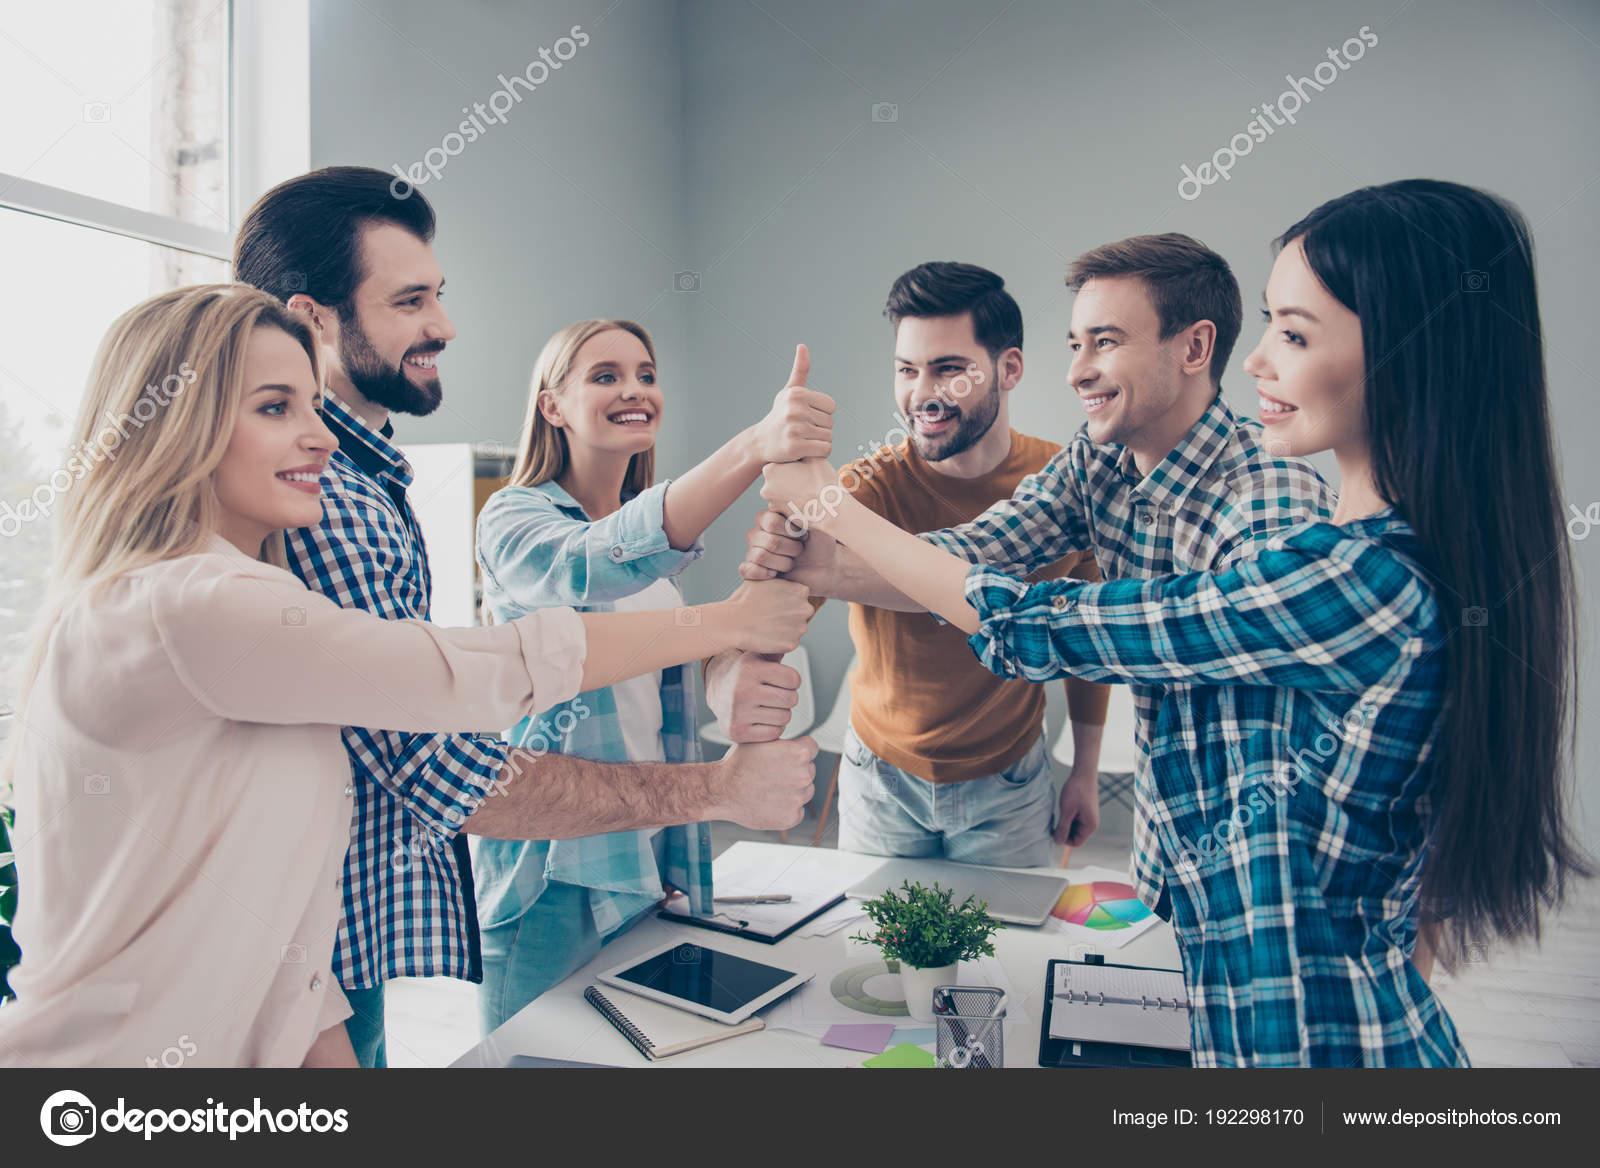 Agreement Achievement Harmony Progress Motivation Joining